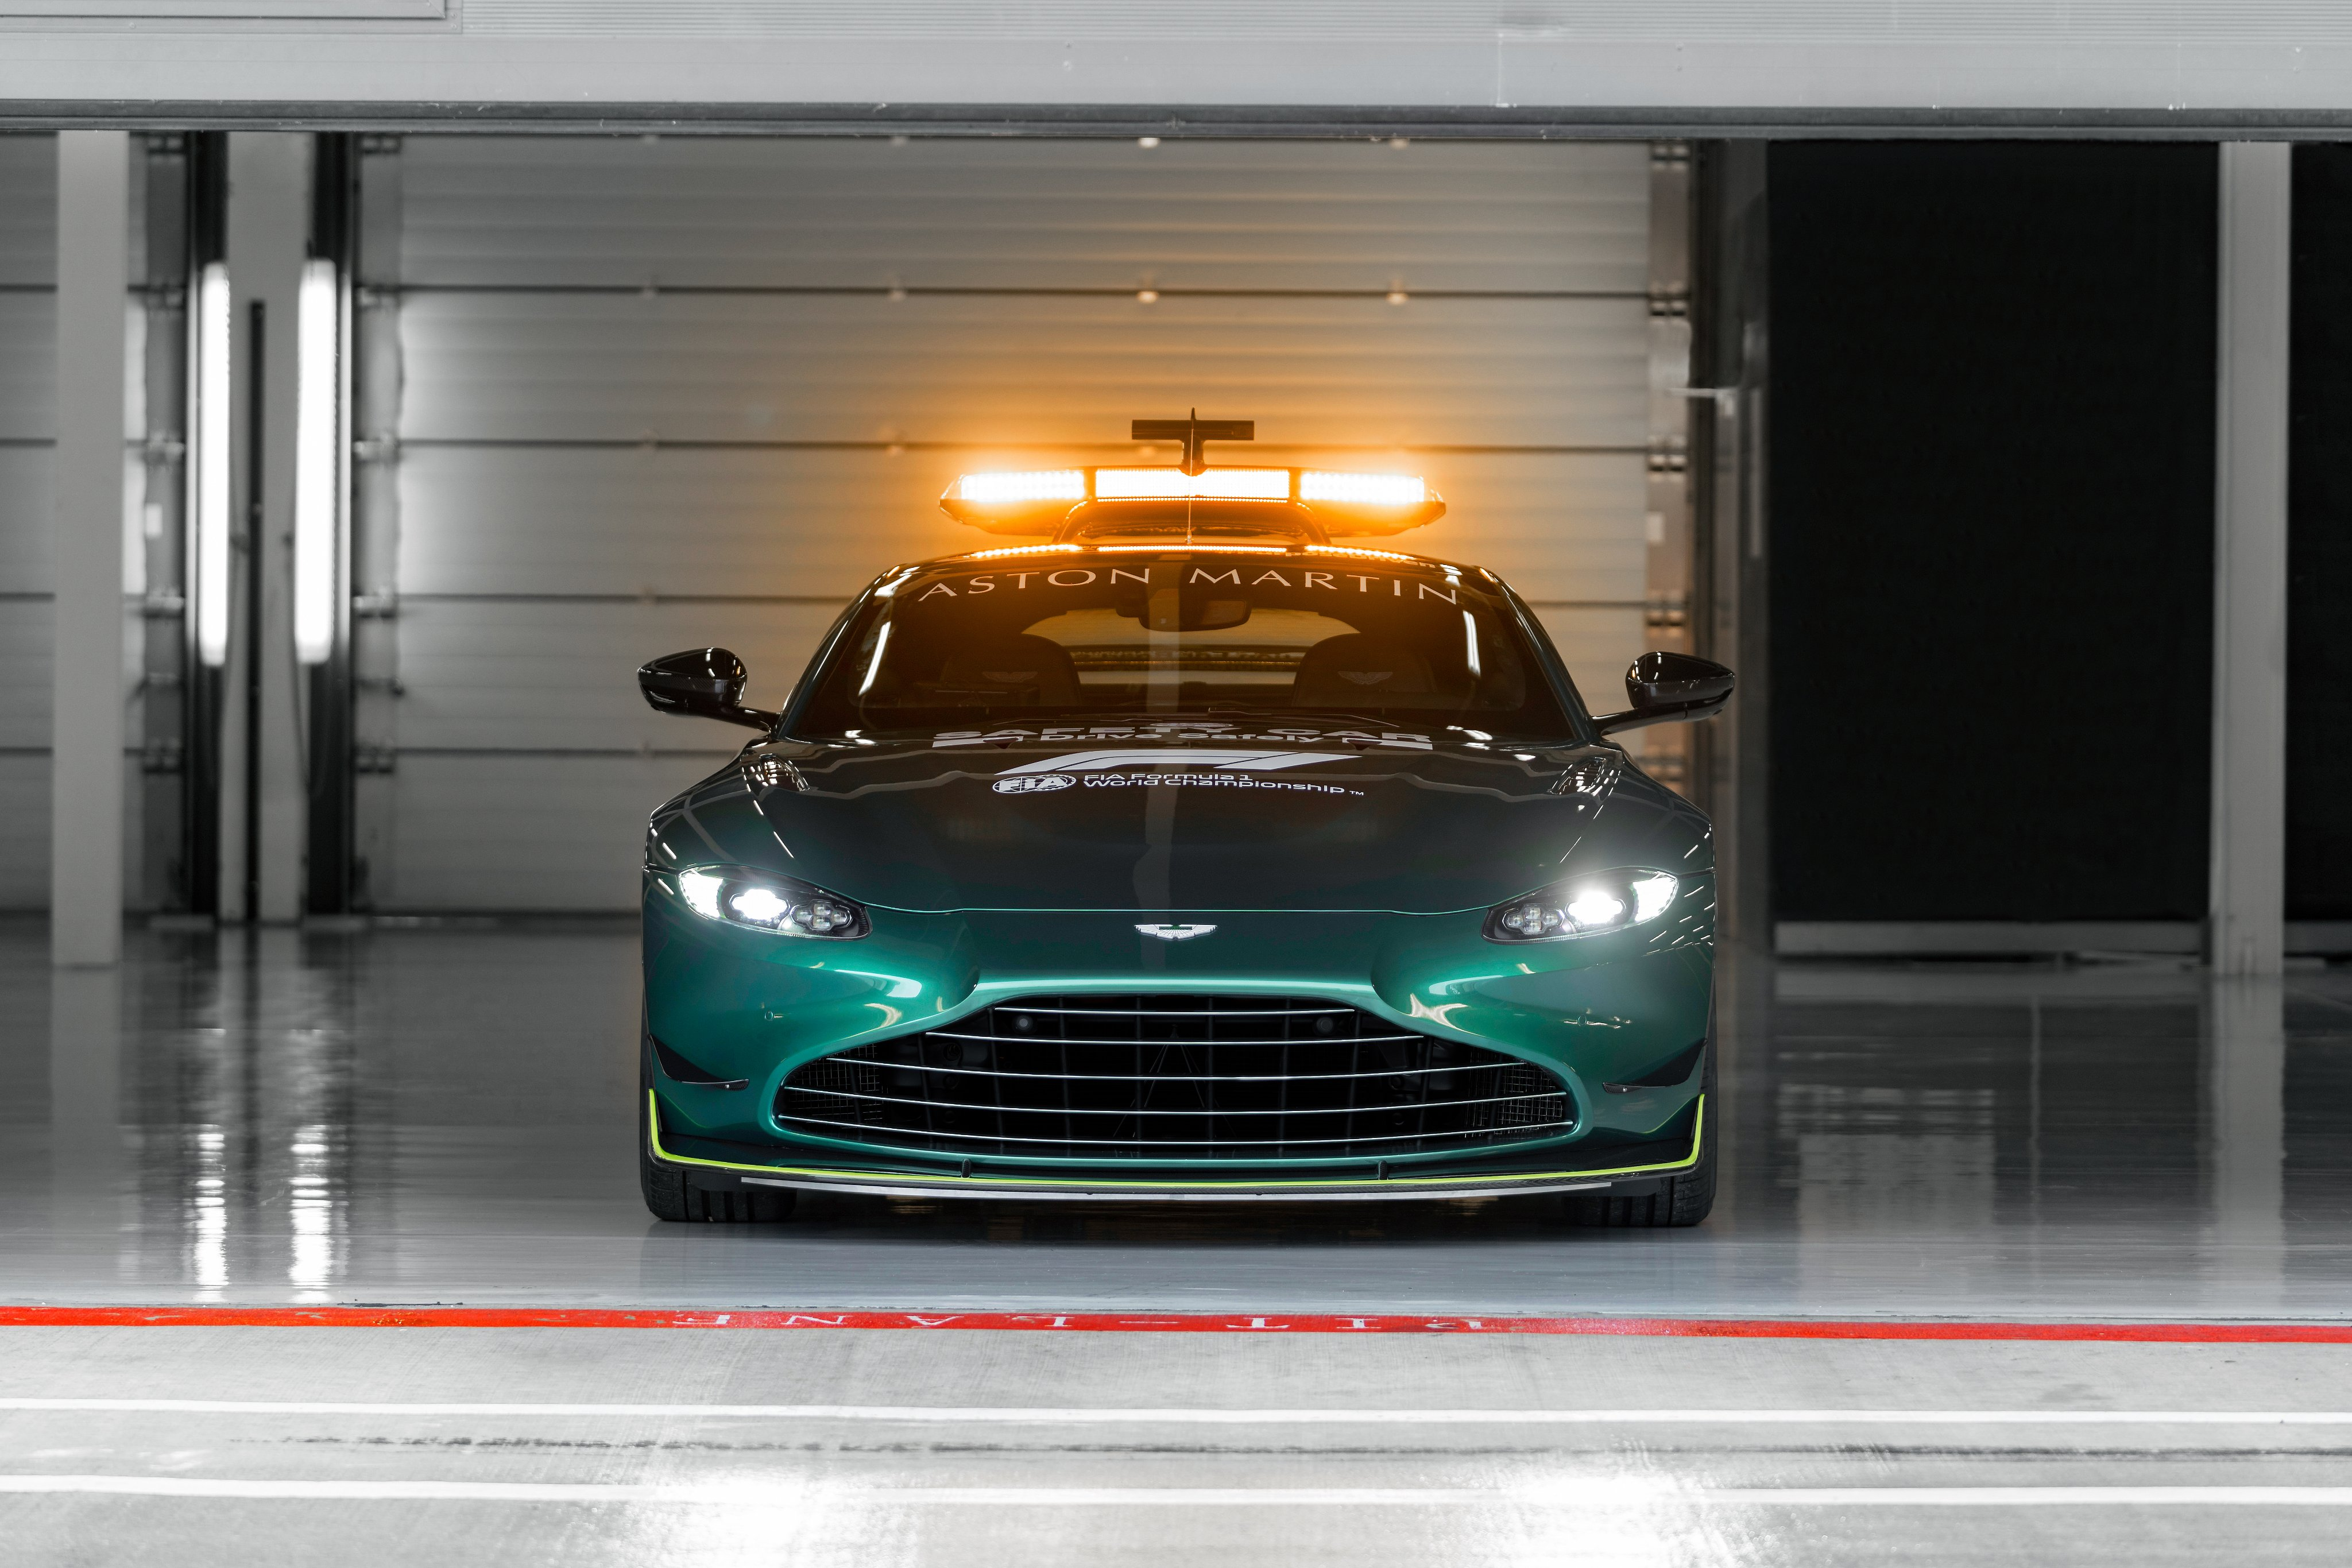 aston-martin-vantage-safety-car-soymotor.jpg